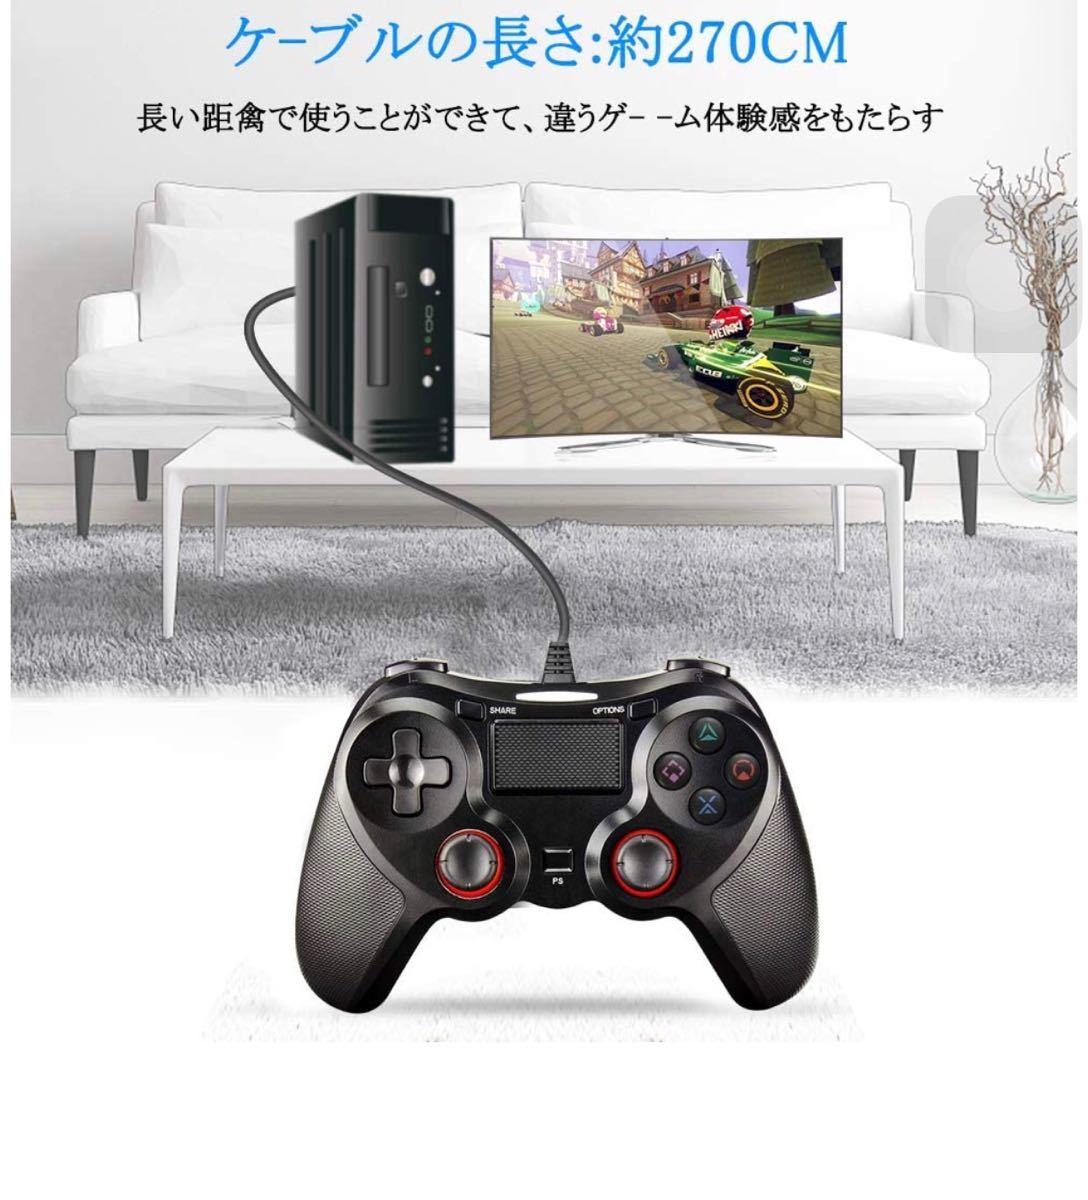 PS4コントローラー 有線 PC USB 有線ゲームパッド 人体工学 2重振動